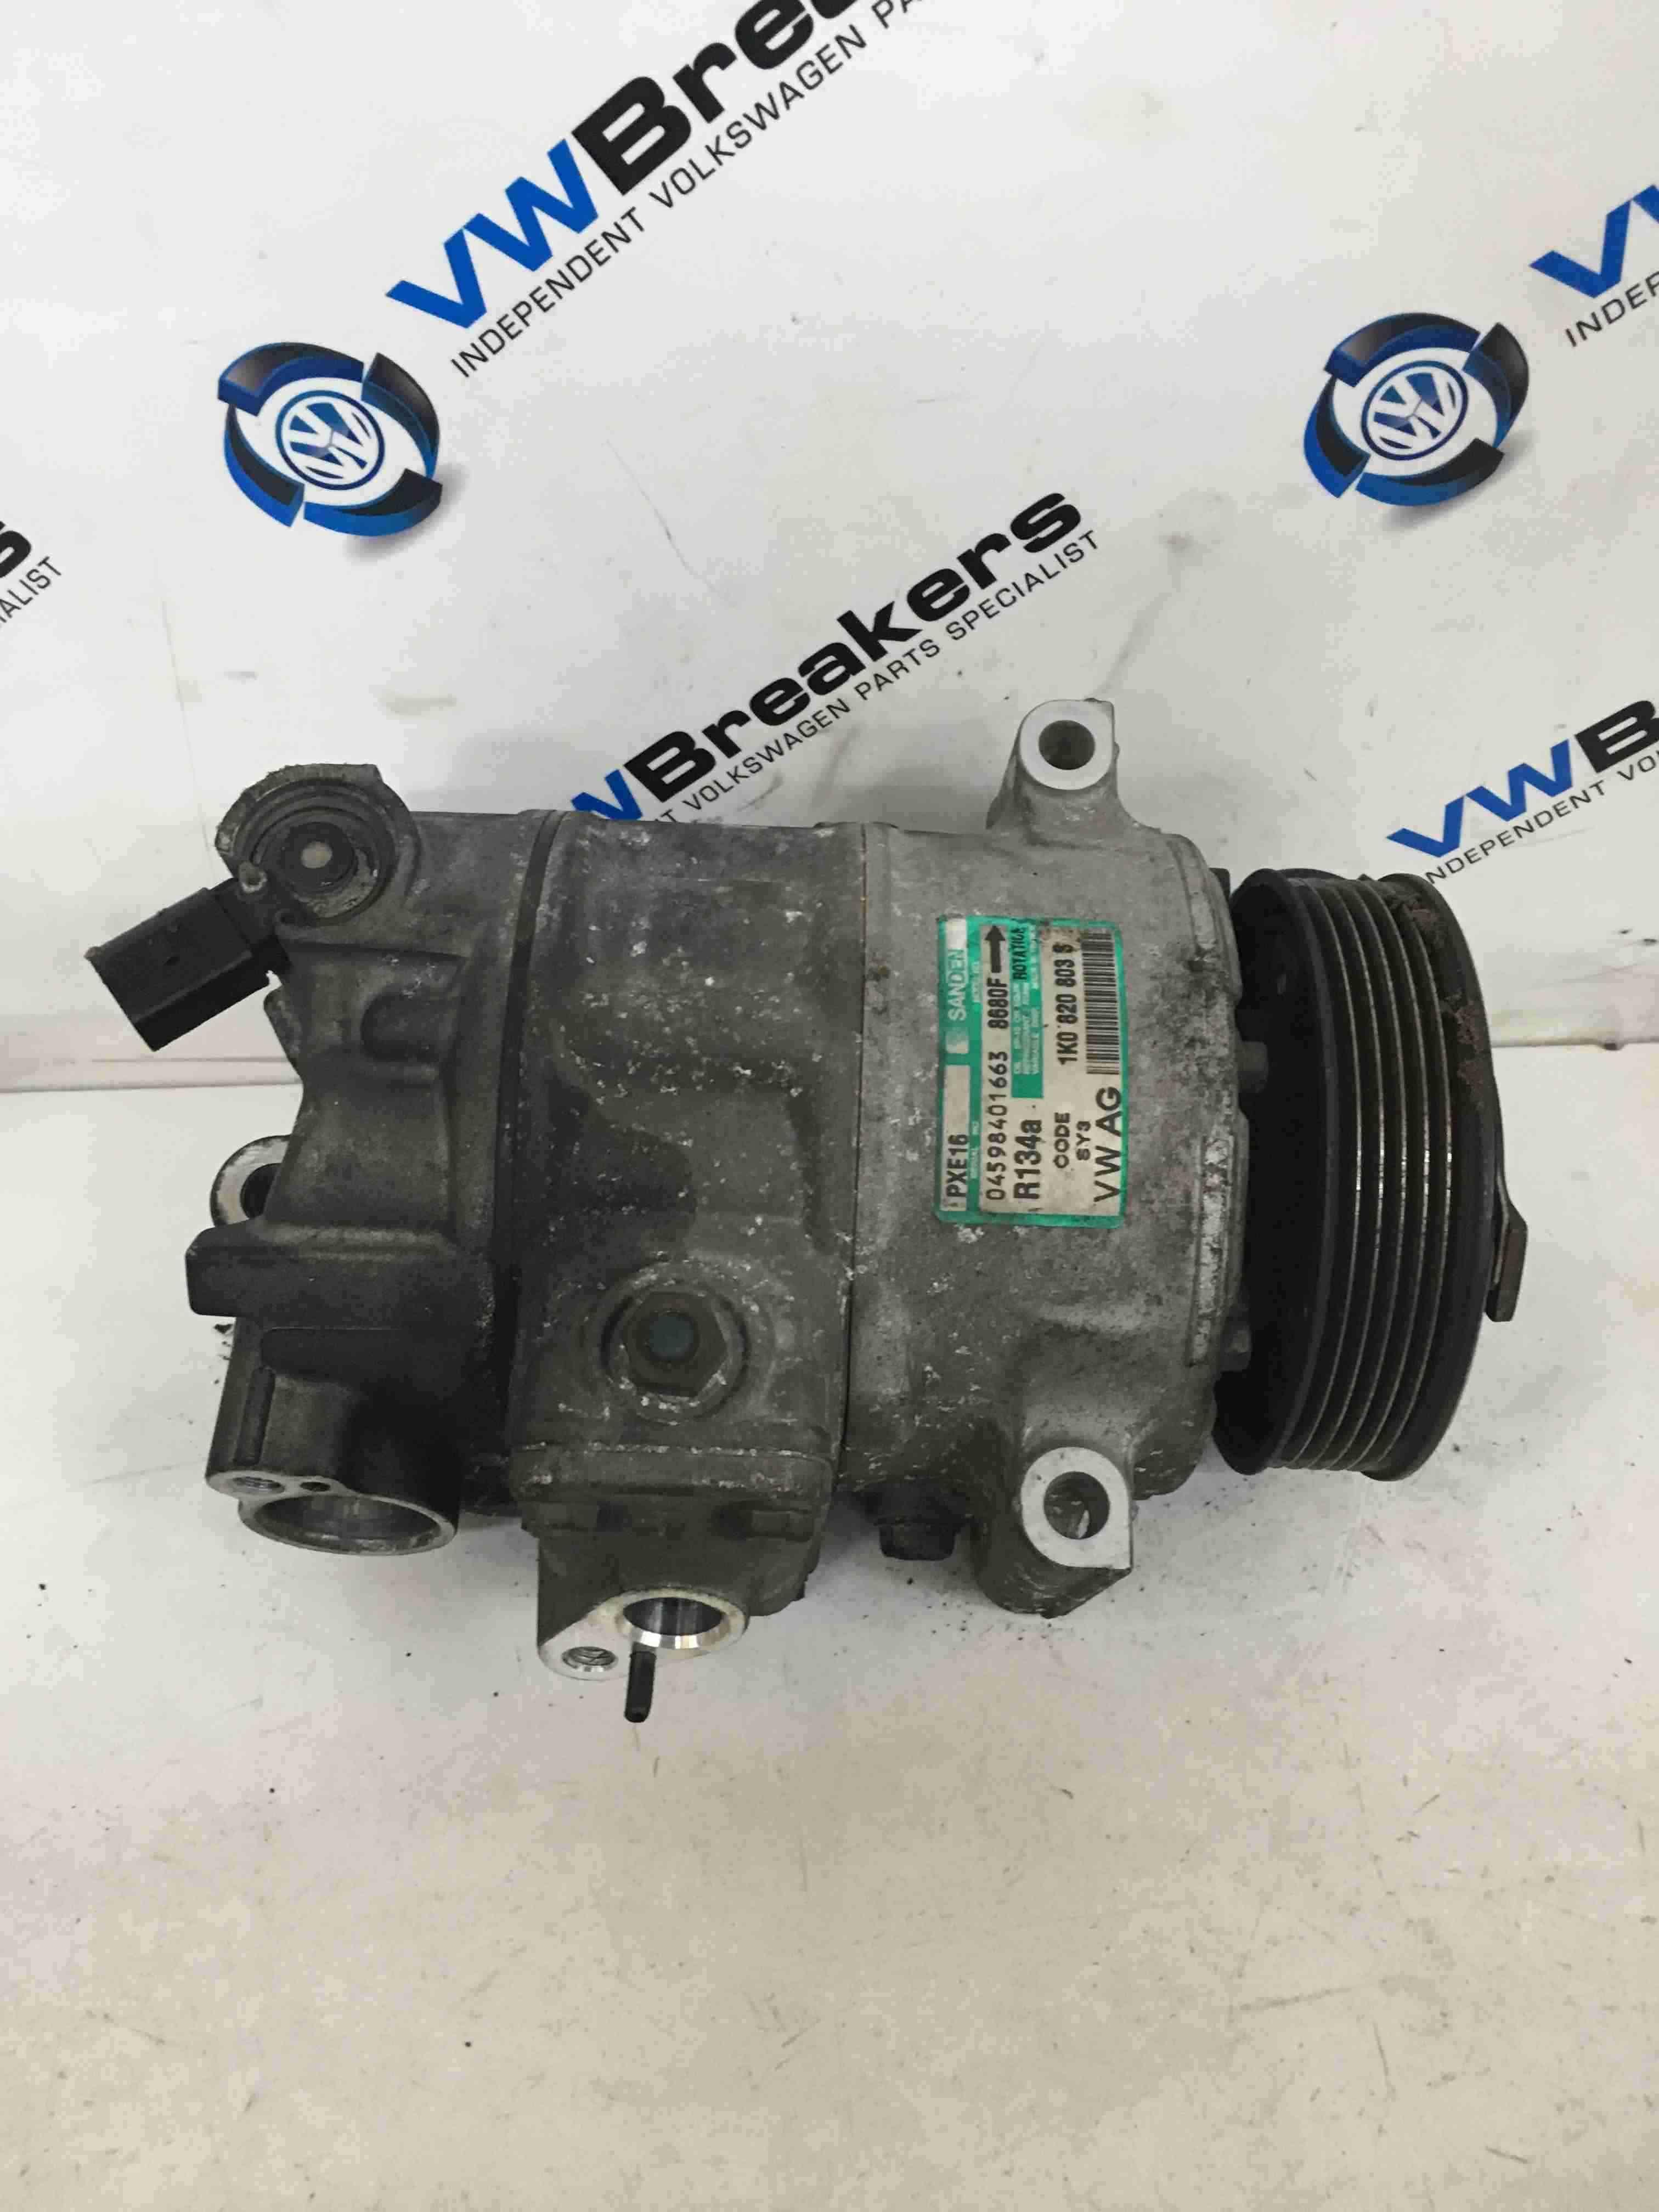 Volkswagen Passat B6 2005-2010 Aircon Pump Compressor Unit 1K0820803S 1k0820803s